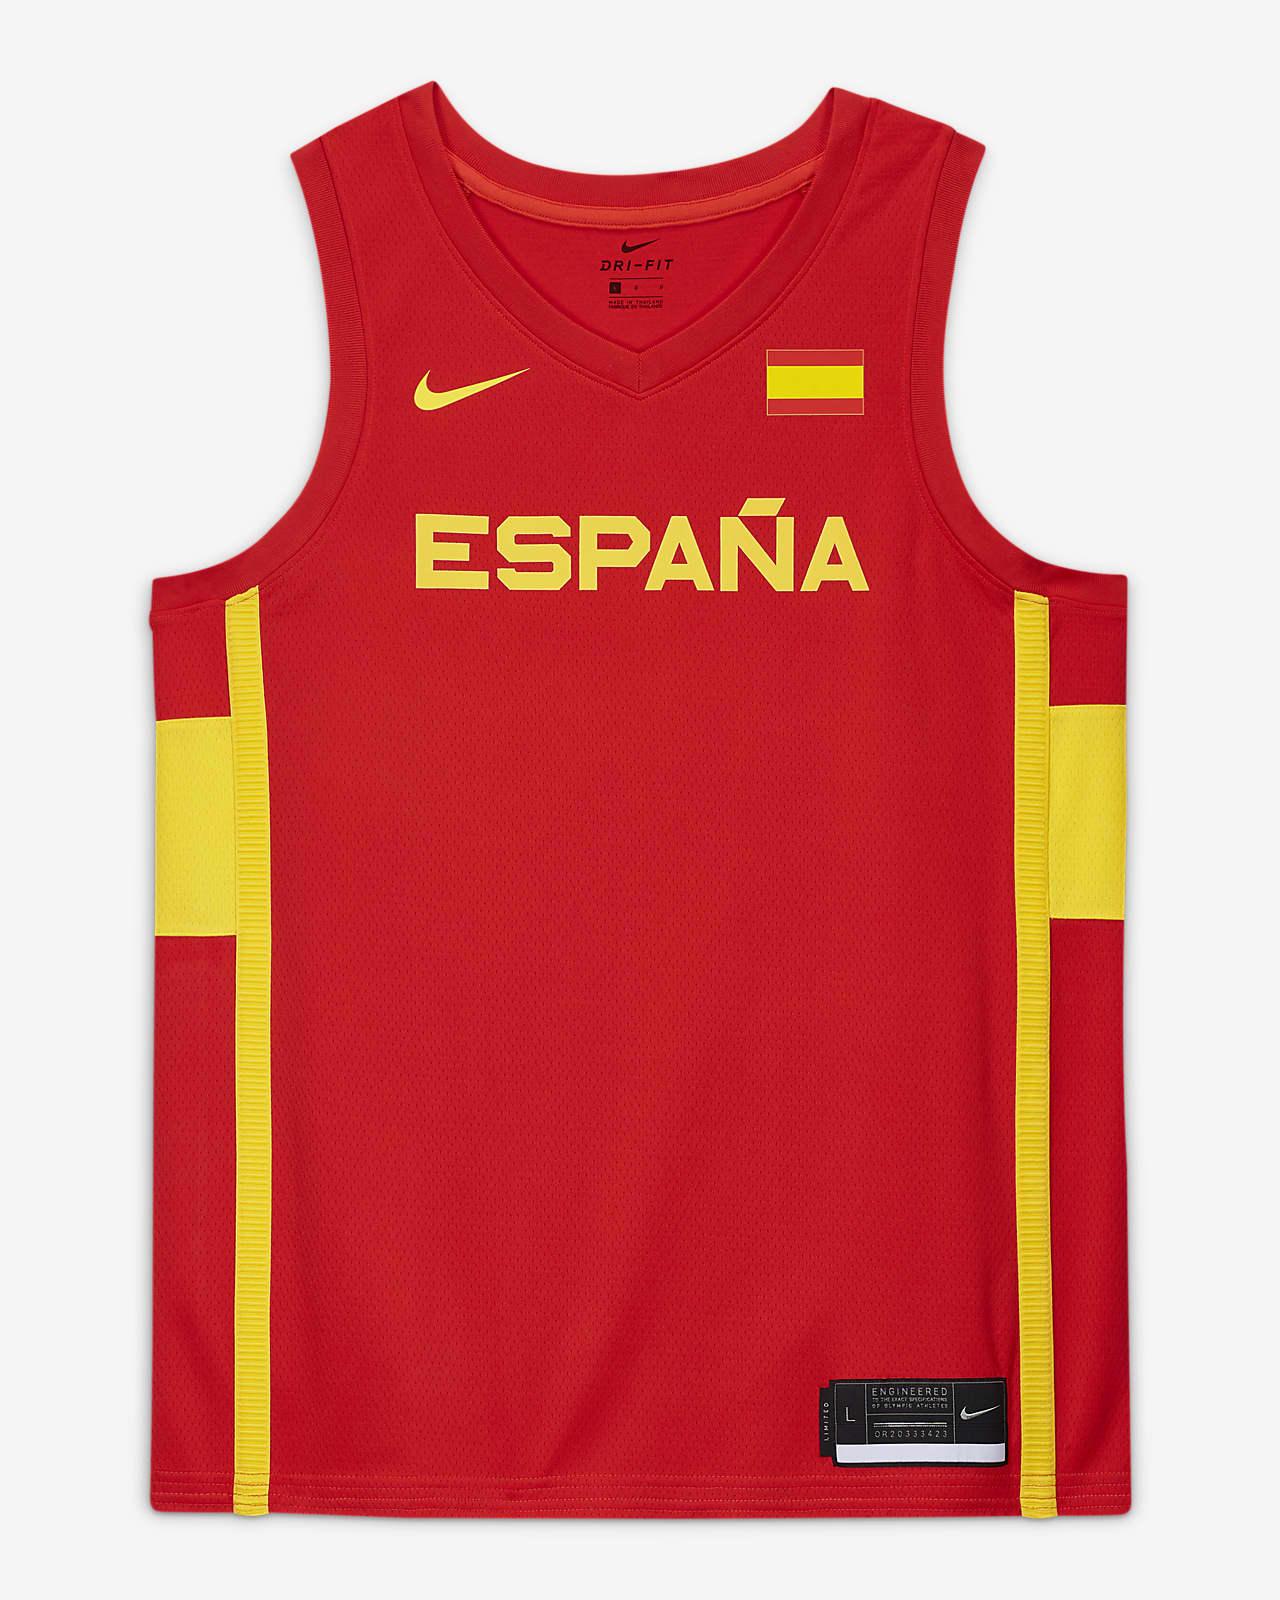 Мужское баскетбольное джерси Nike Spain Nike (Road) Limited